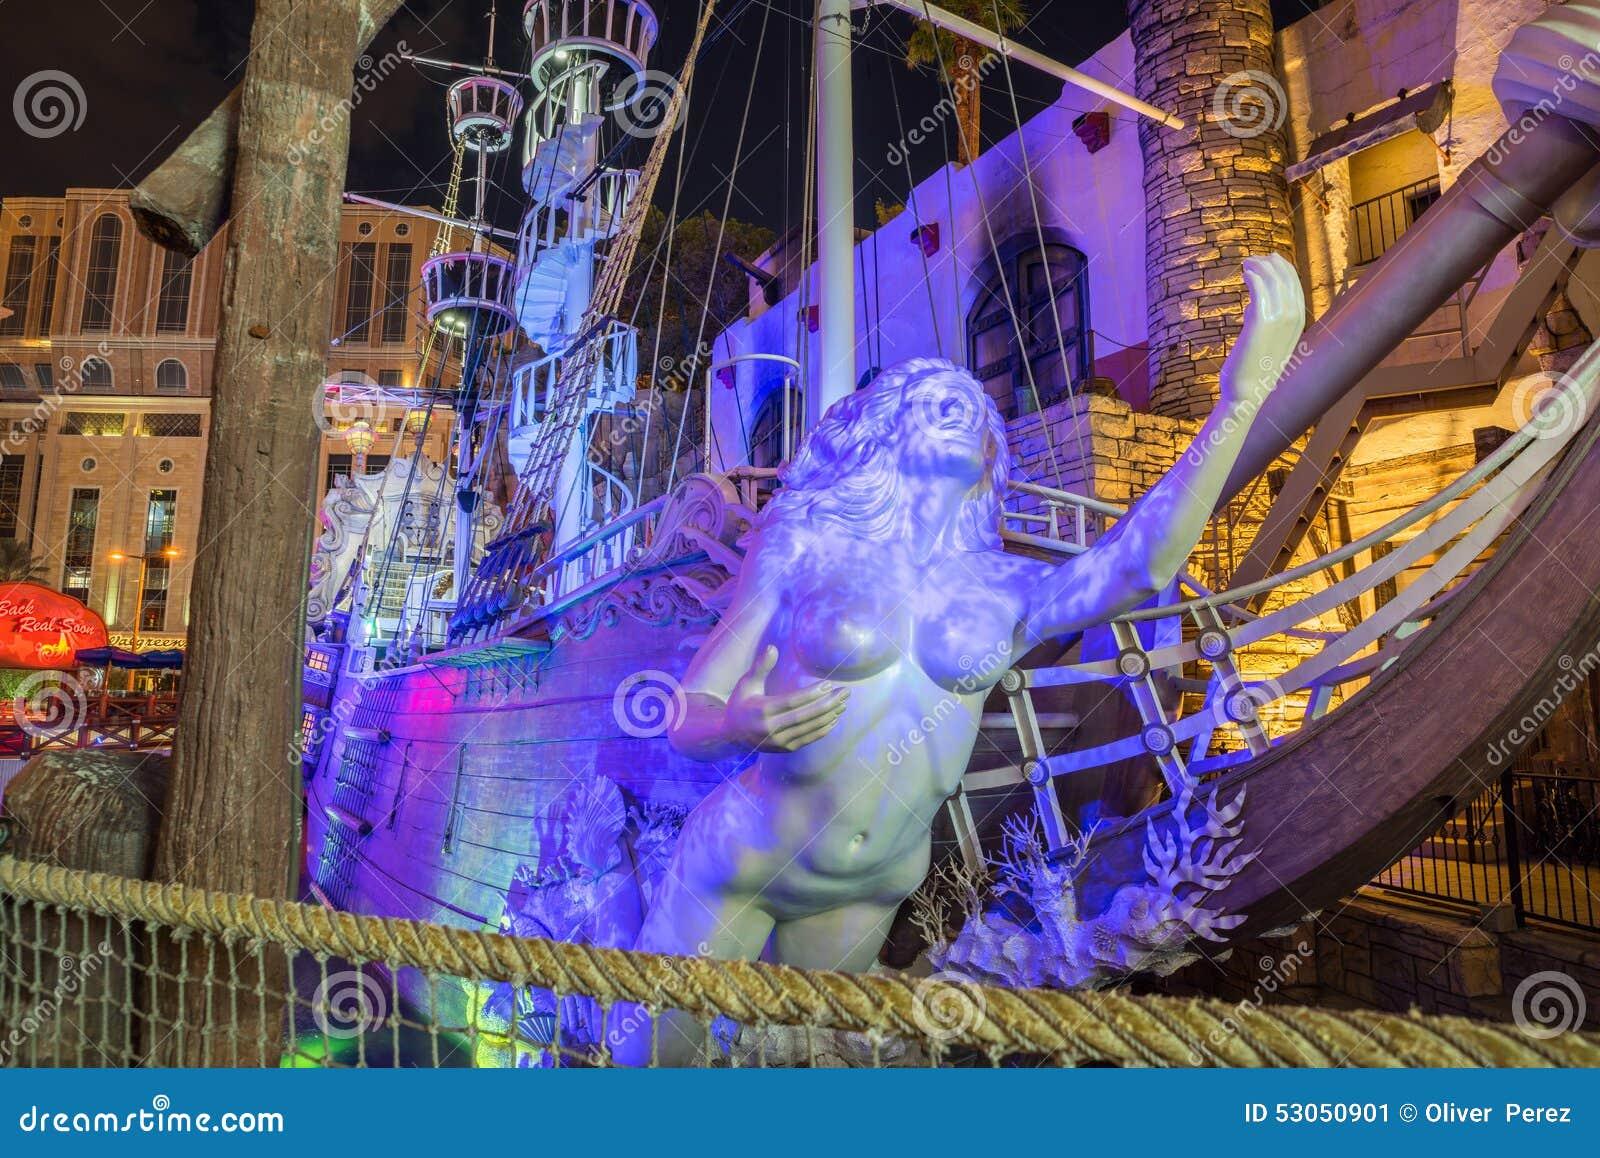 Treasure Island Las Vegas Pirate Ships